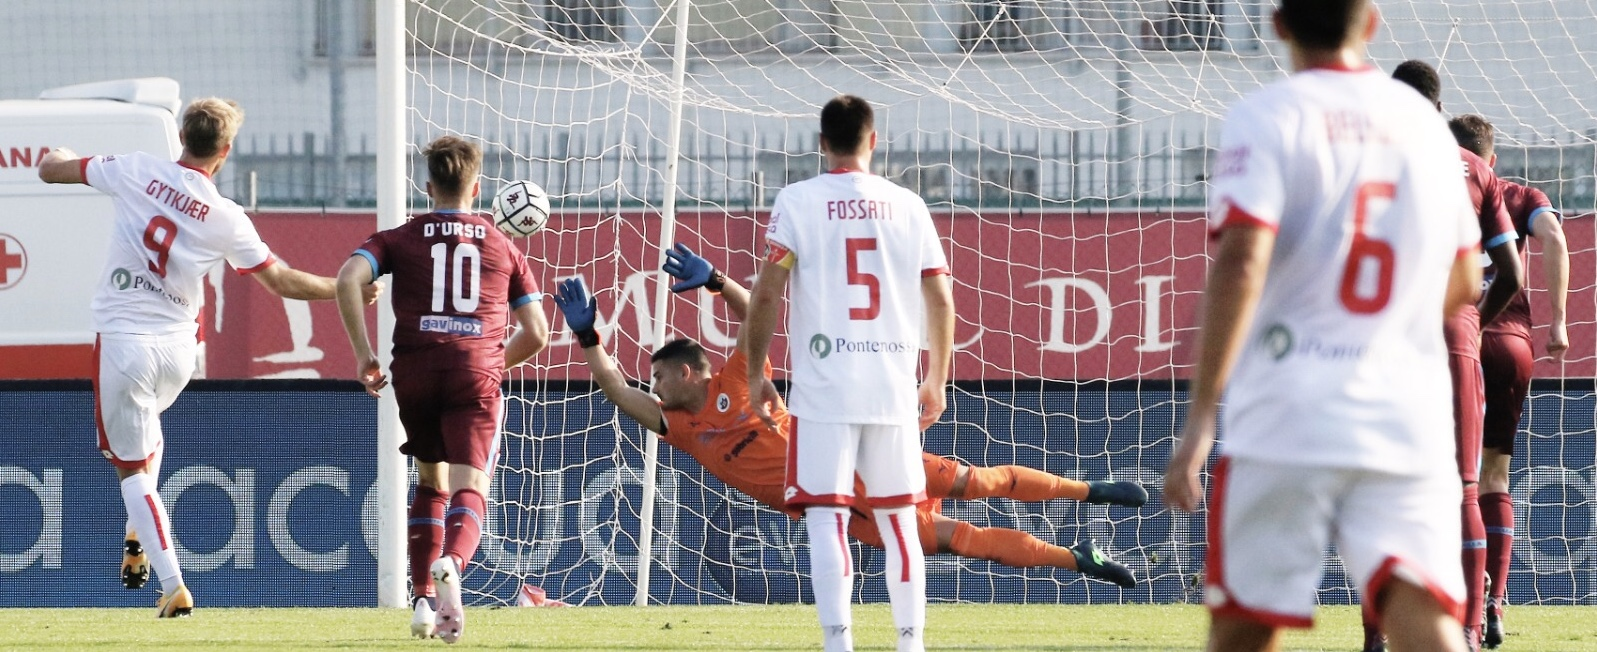 Cittadella – Monza 1 – 2